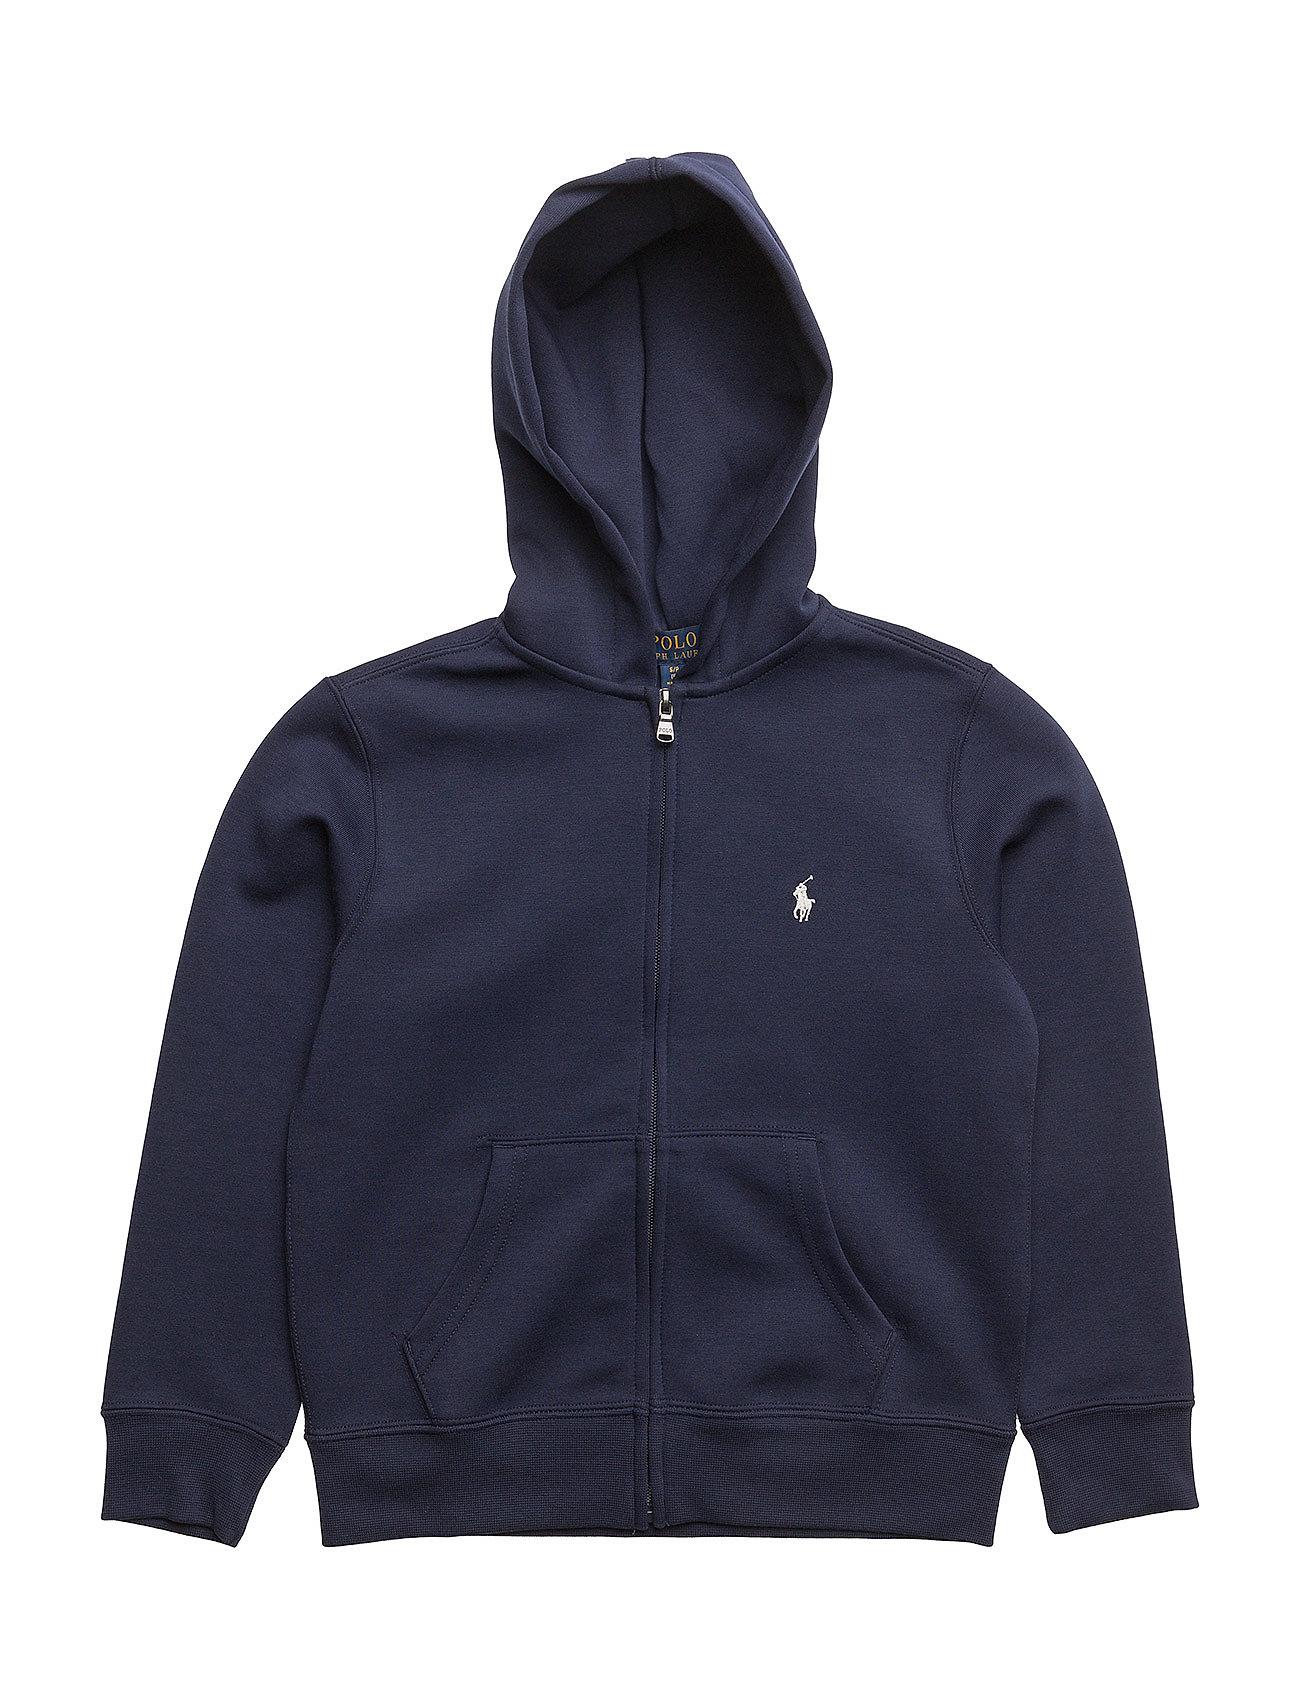 dbc453ef0be3f6 Double-knit Full-zip Hoodie (French Navy) (£89) - Ralph Lauren Kids ...